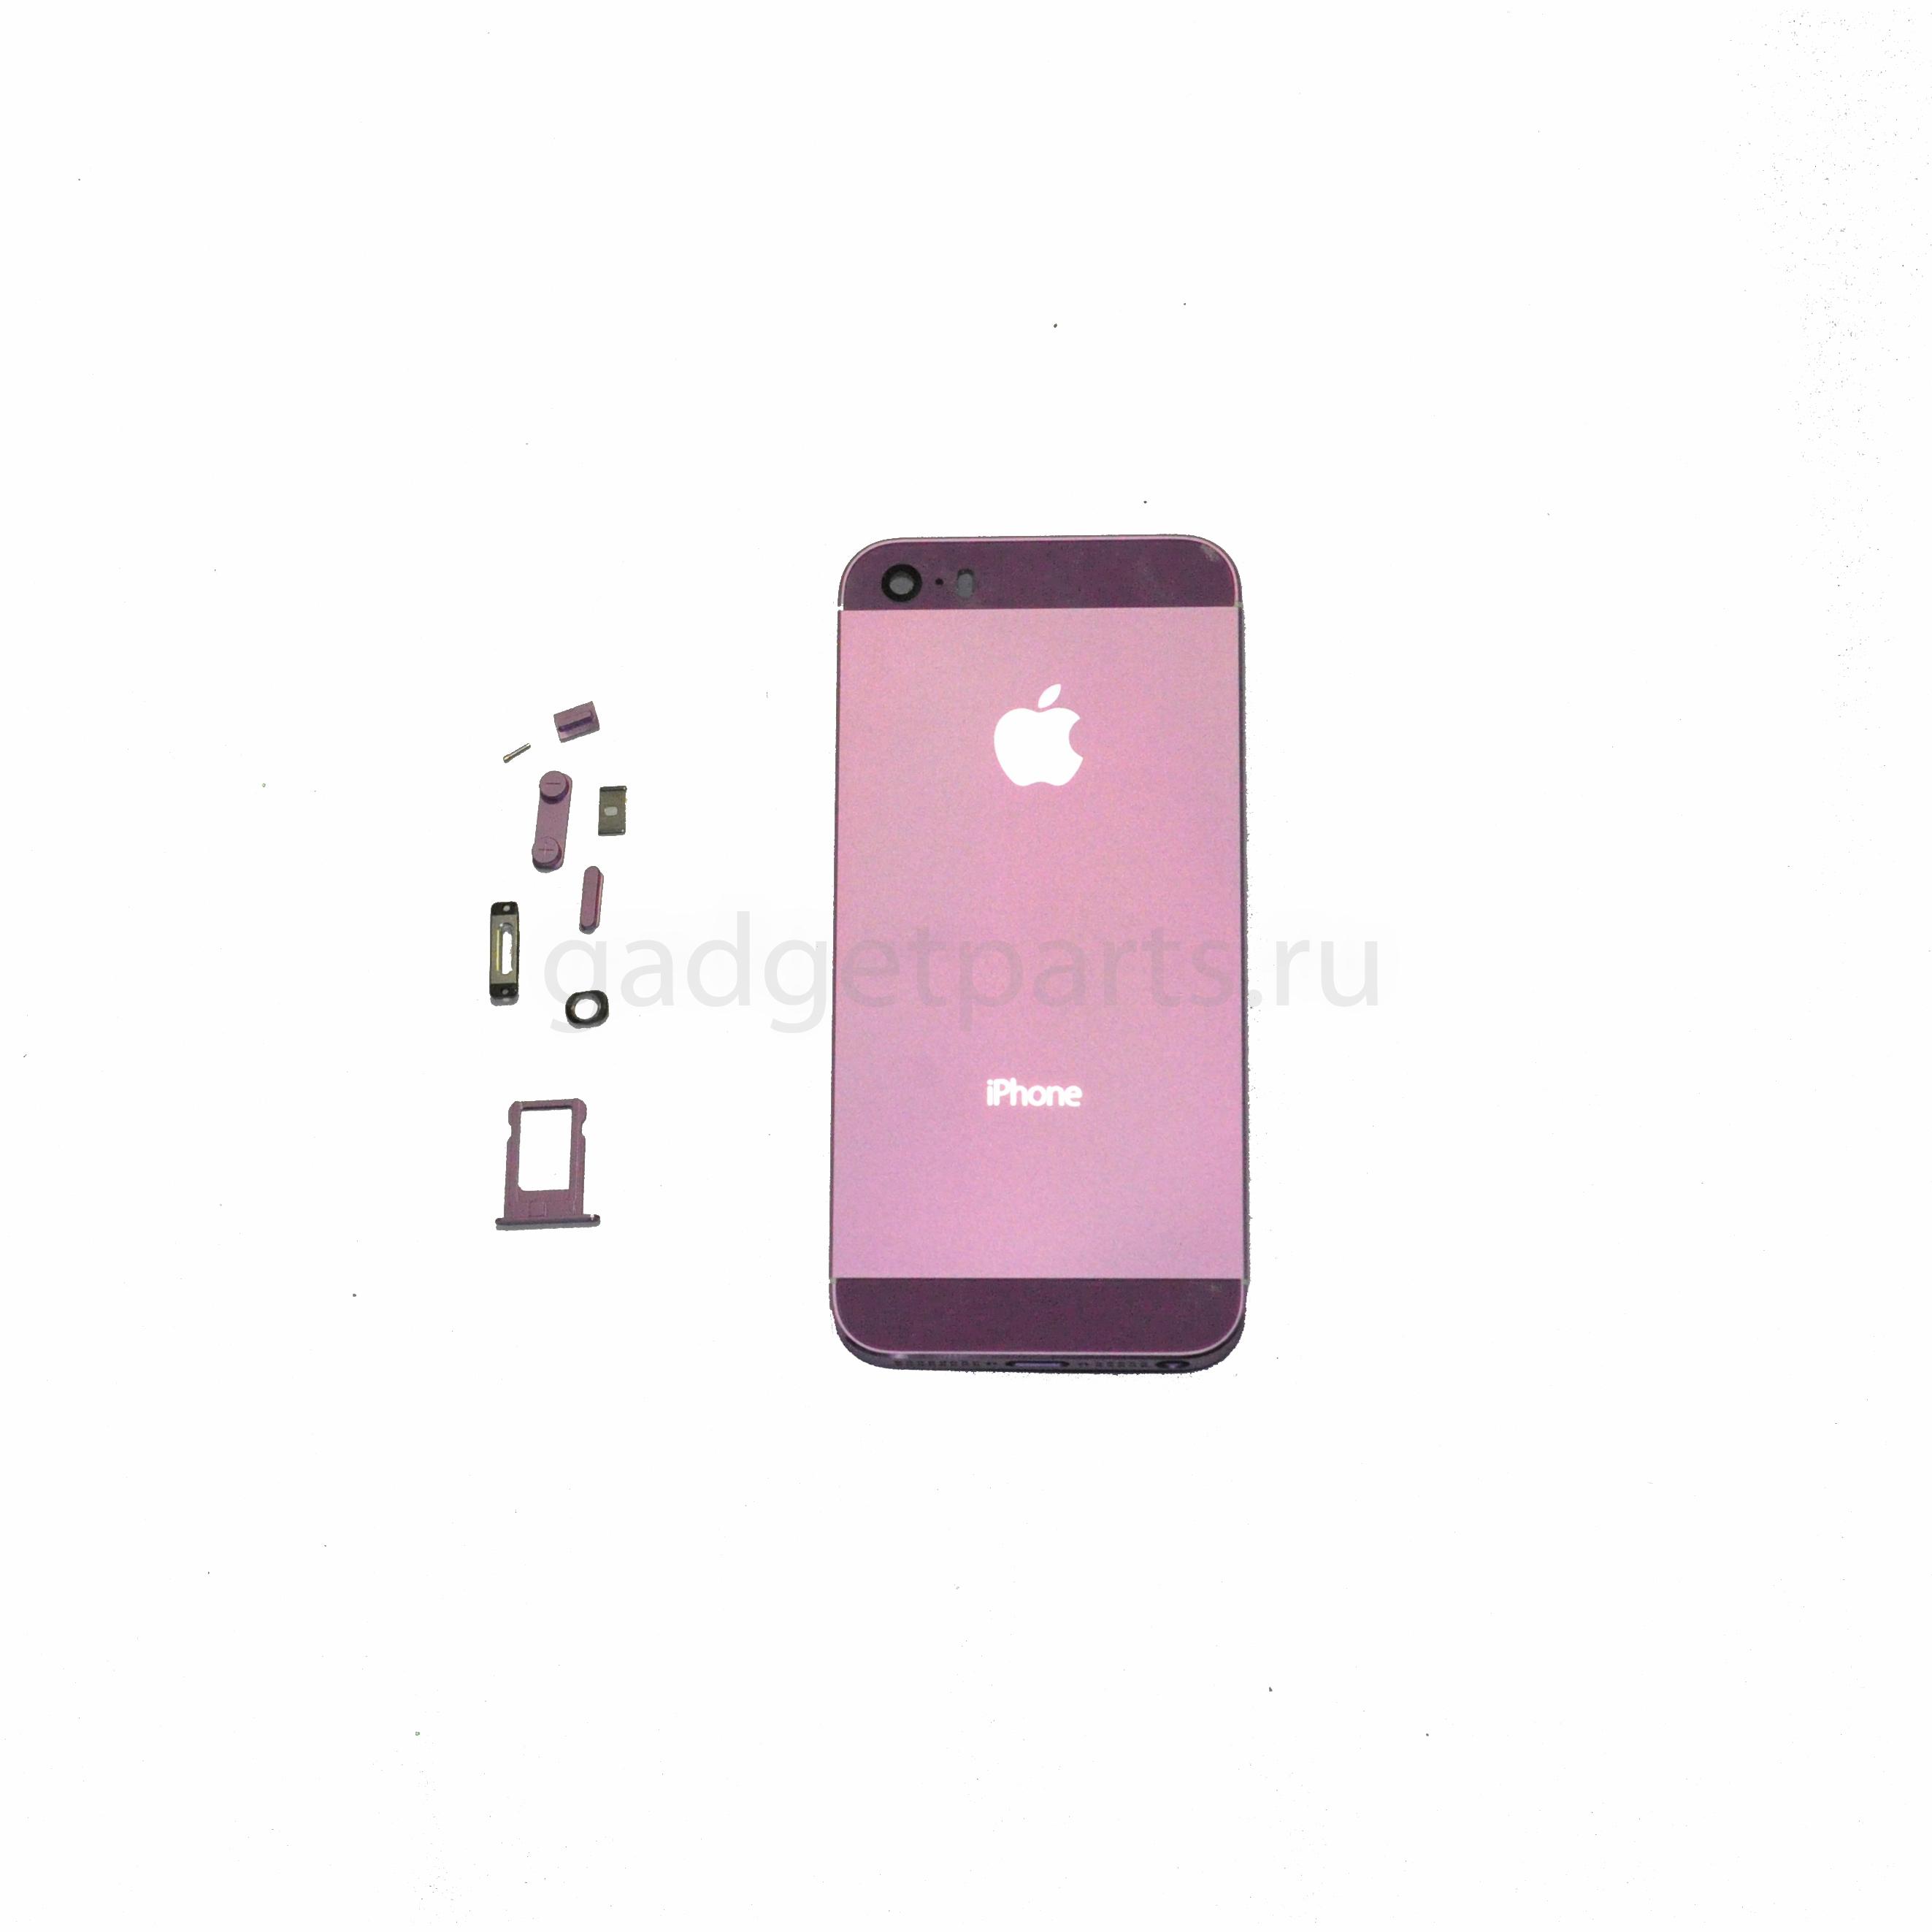 Задняя крышка iPhone 5S Фиолетовая (Purple)